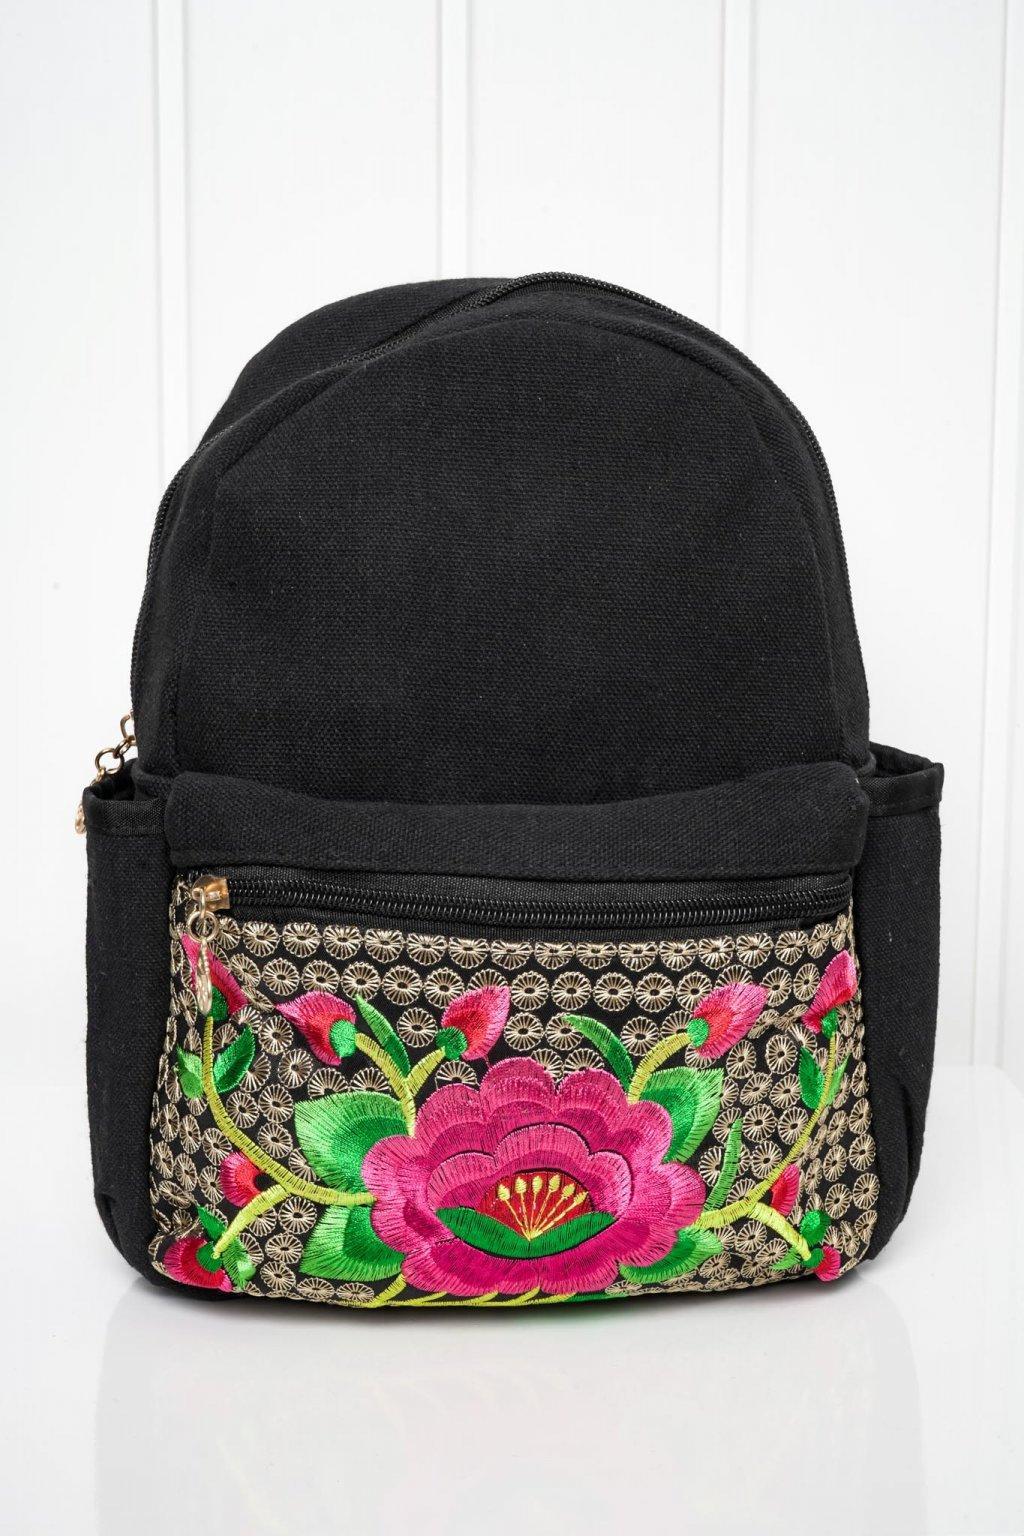 Kabelka, crossbody, ruksak, shopping bag, shopperka, 150